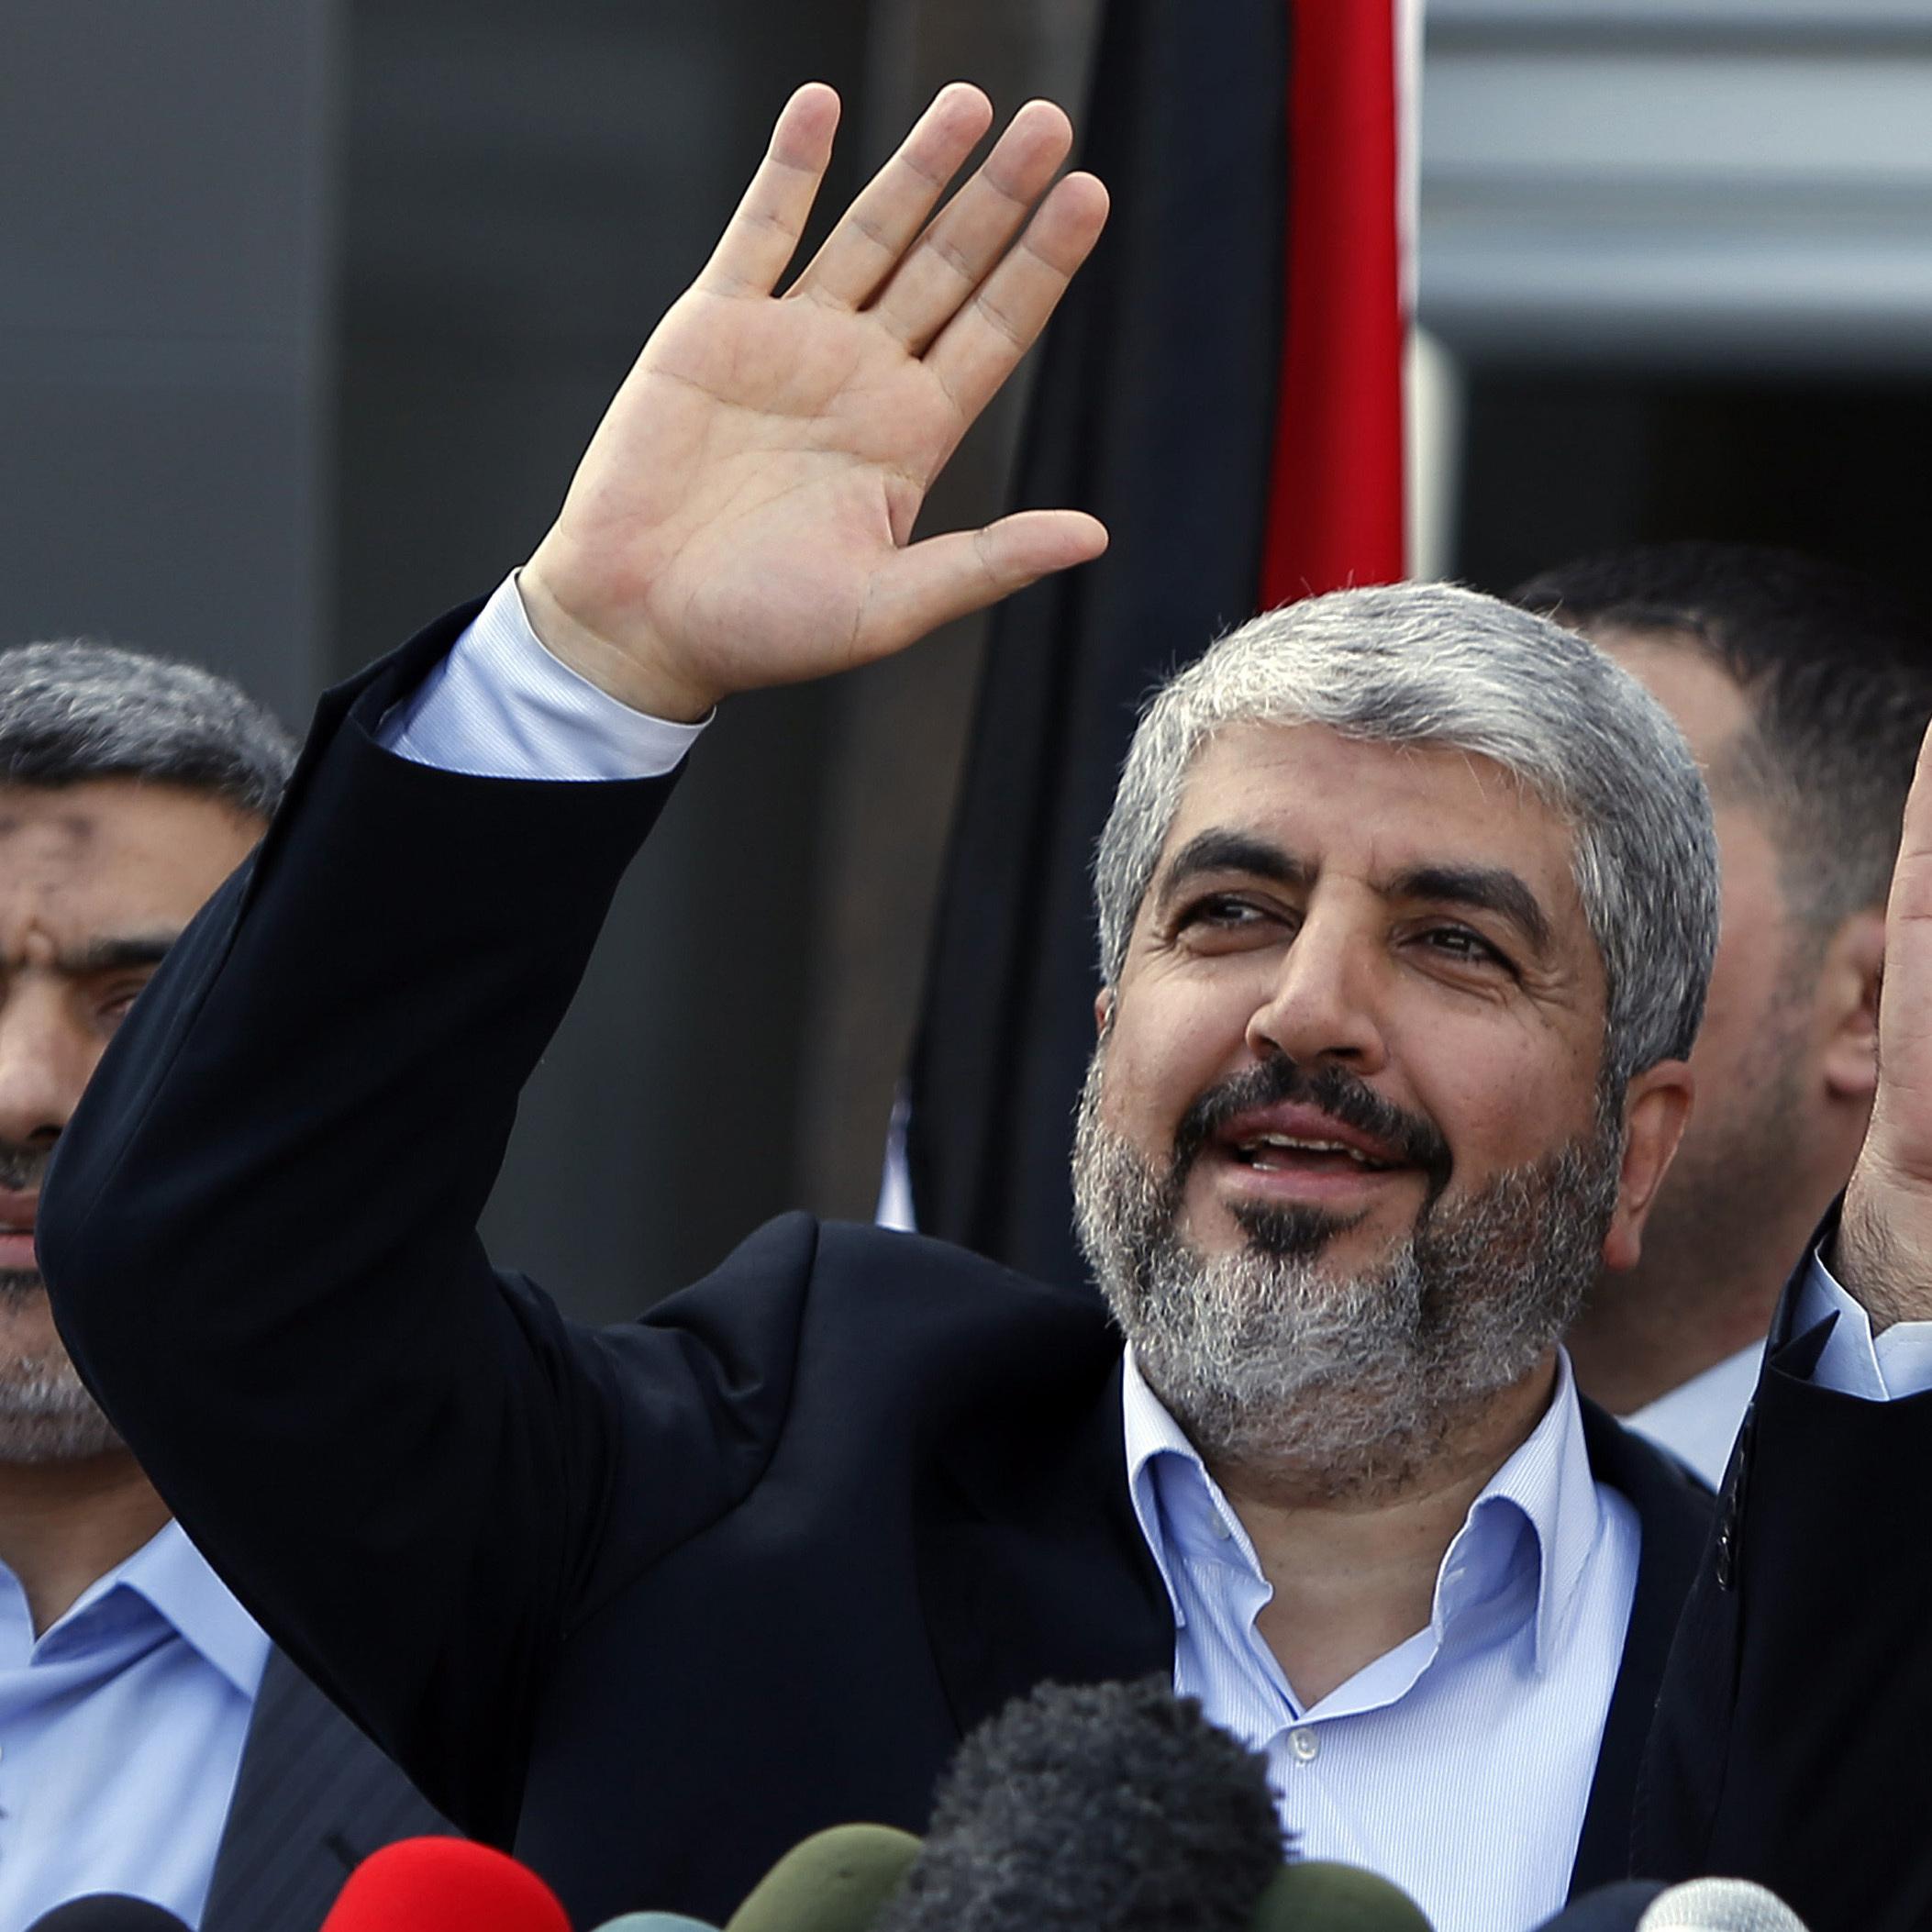 khaled ibrahim c v chief 28 images gaza itv news